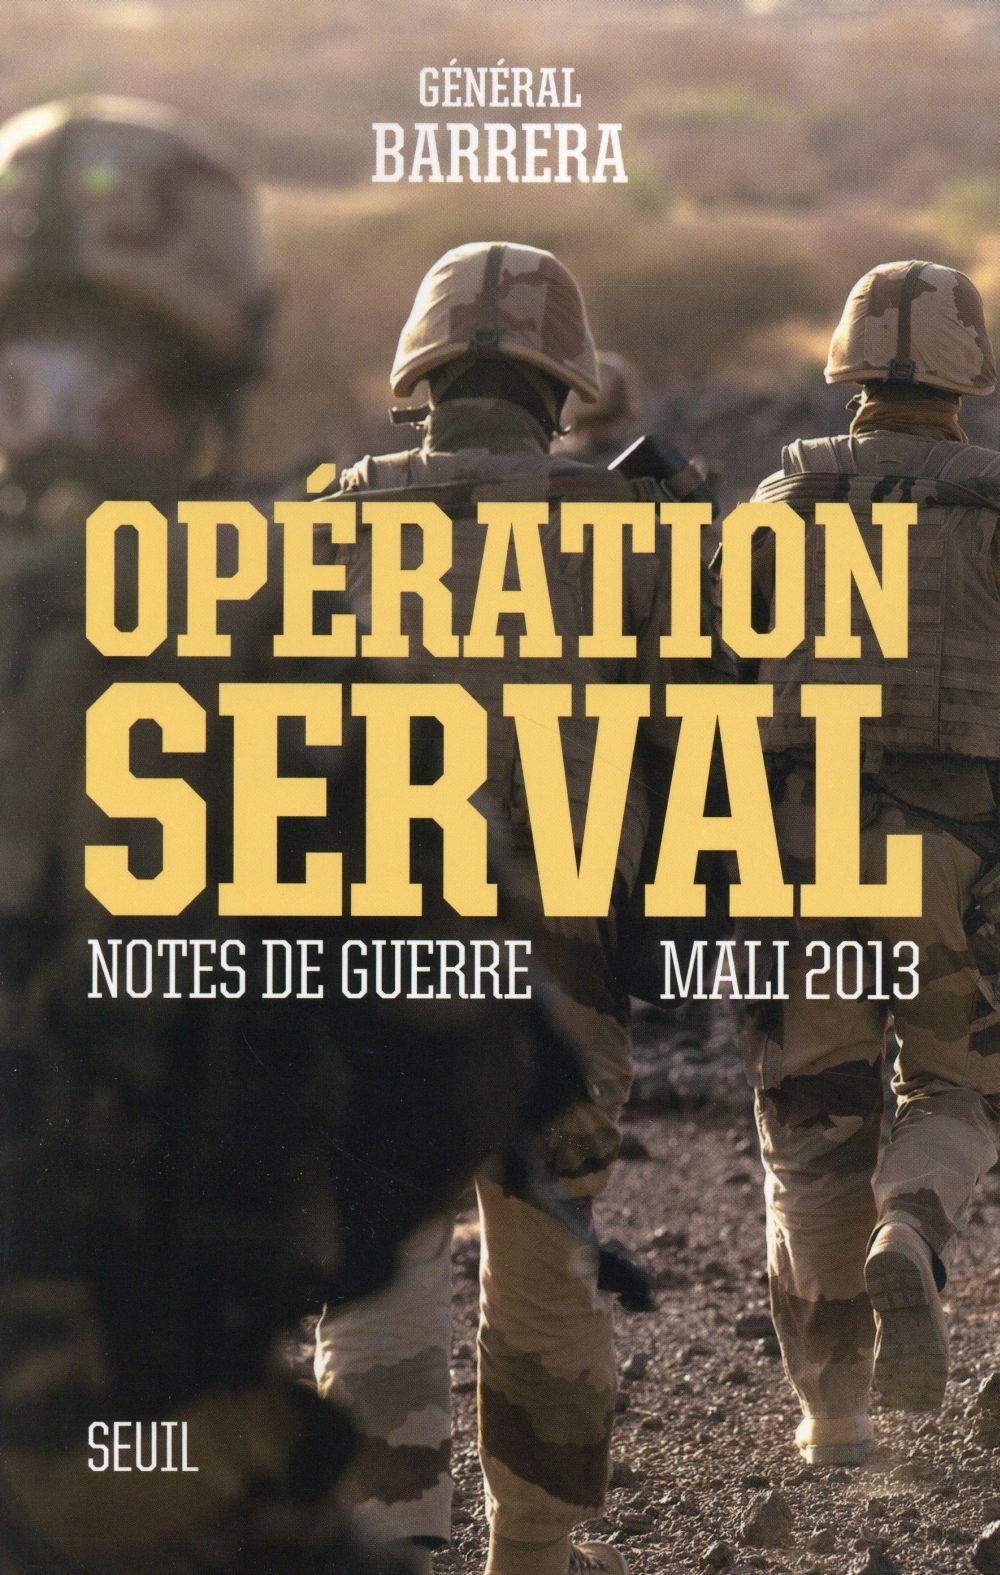 Opération Serval ; notes de guerre, Mali 2013